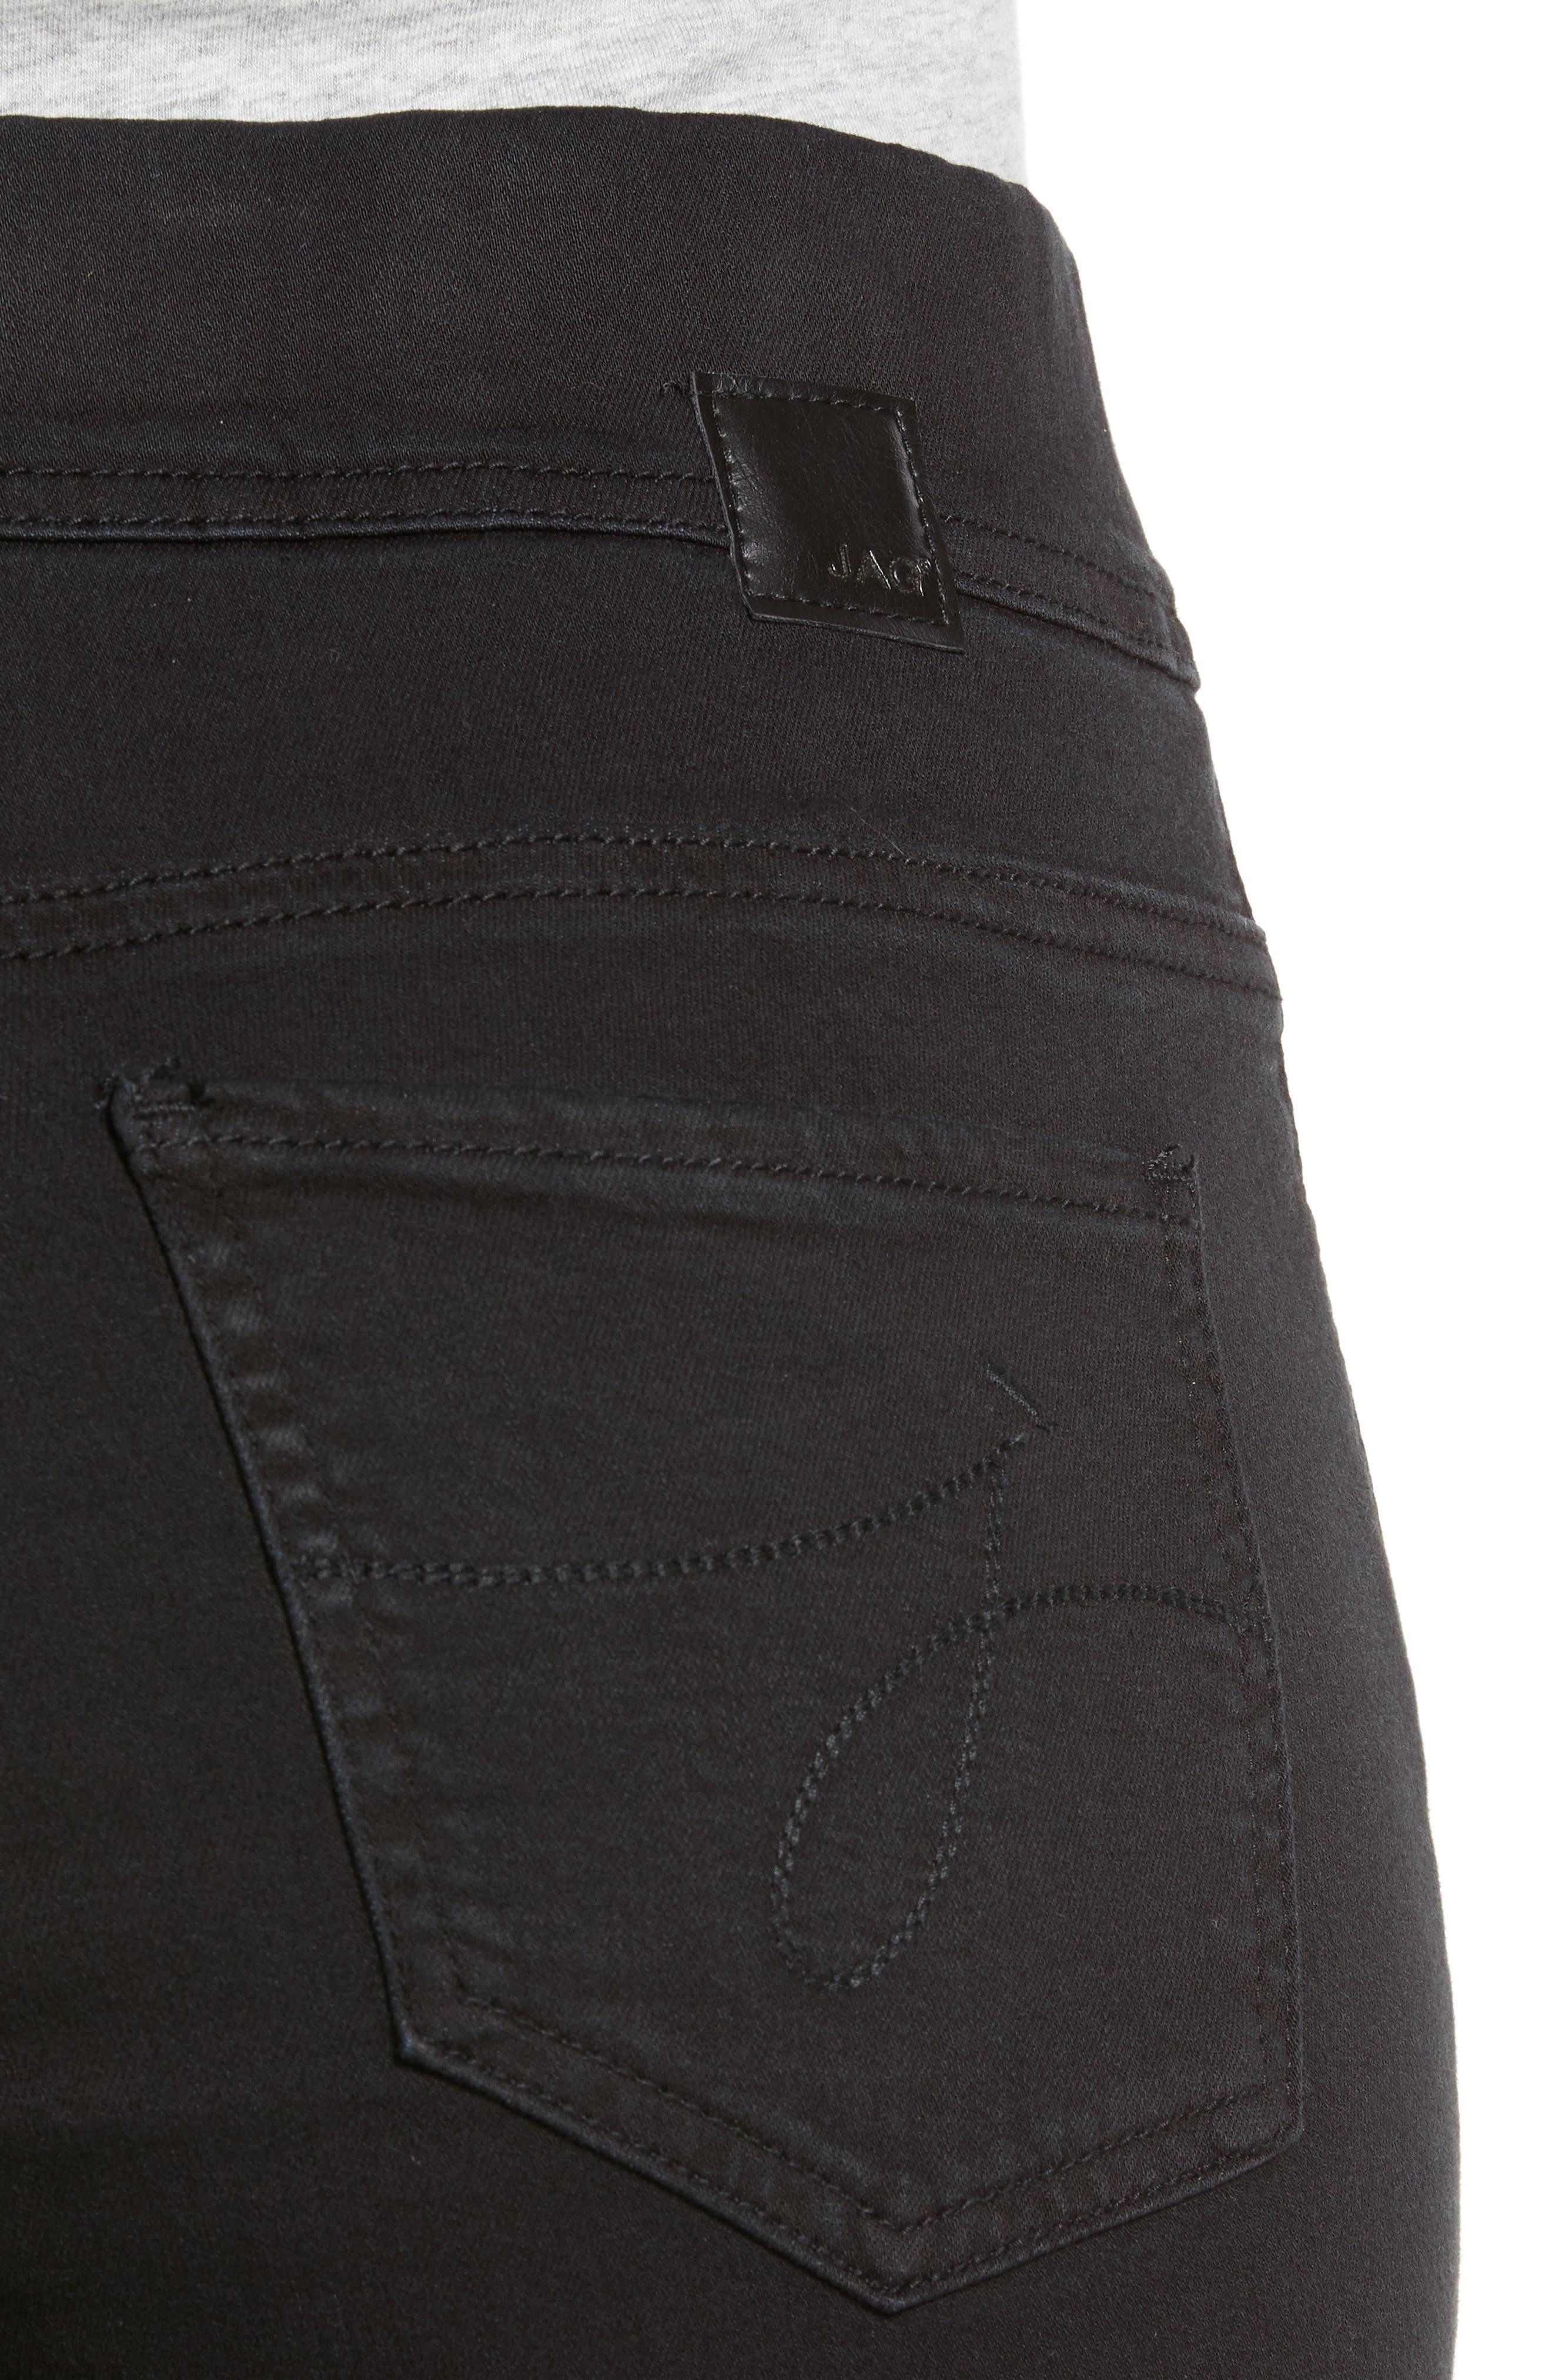 JAG JEANS, Marla Stretch Denim Leggings, Alternate thumbnail 5, color, BLACK